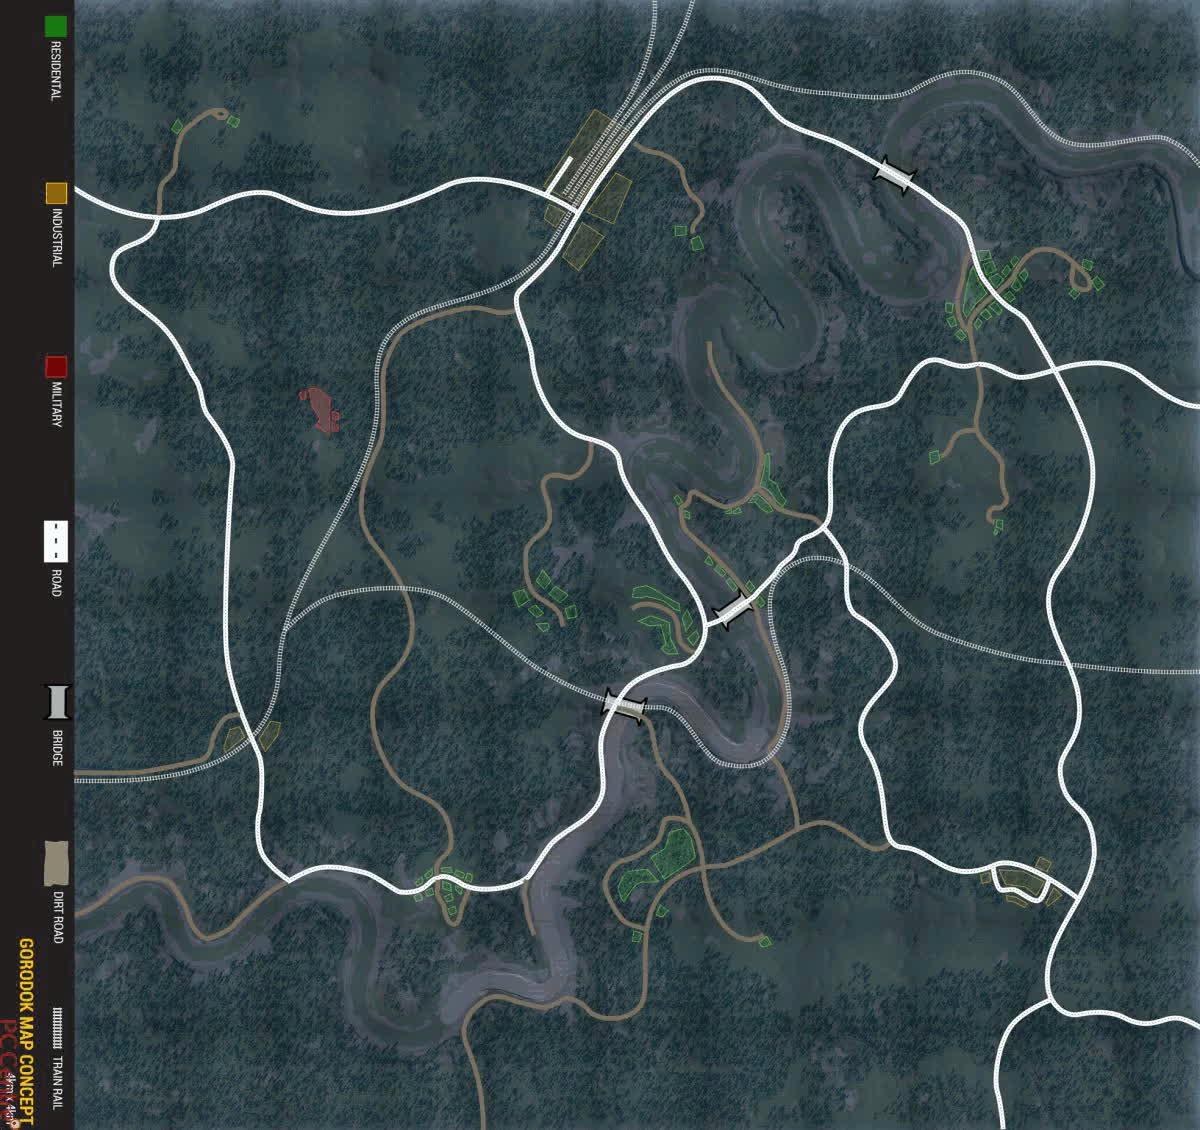 joinsquad, Dev ResponseFuture of Gorodok map (i..com) Dev ResponseFuture of Gorodok map (i..com) comment,reddit,reddit.com,submit,future sq,vote (reddit) GIFs